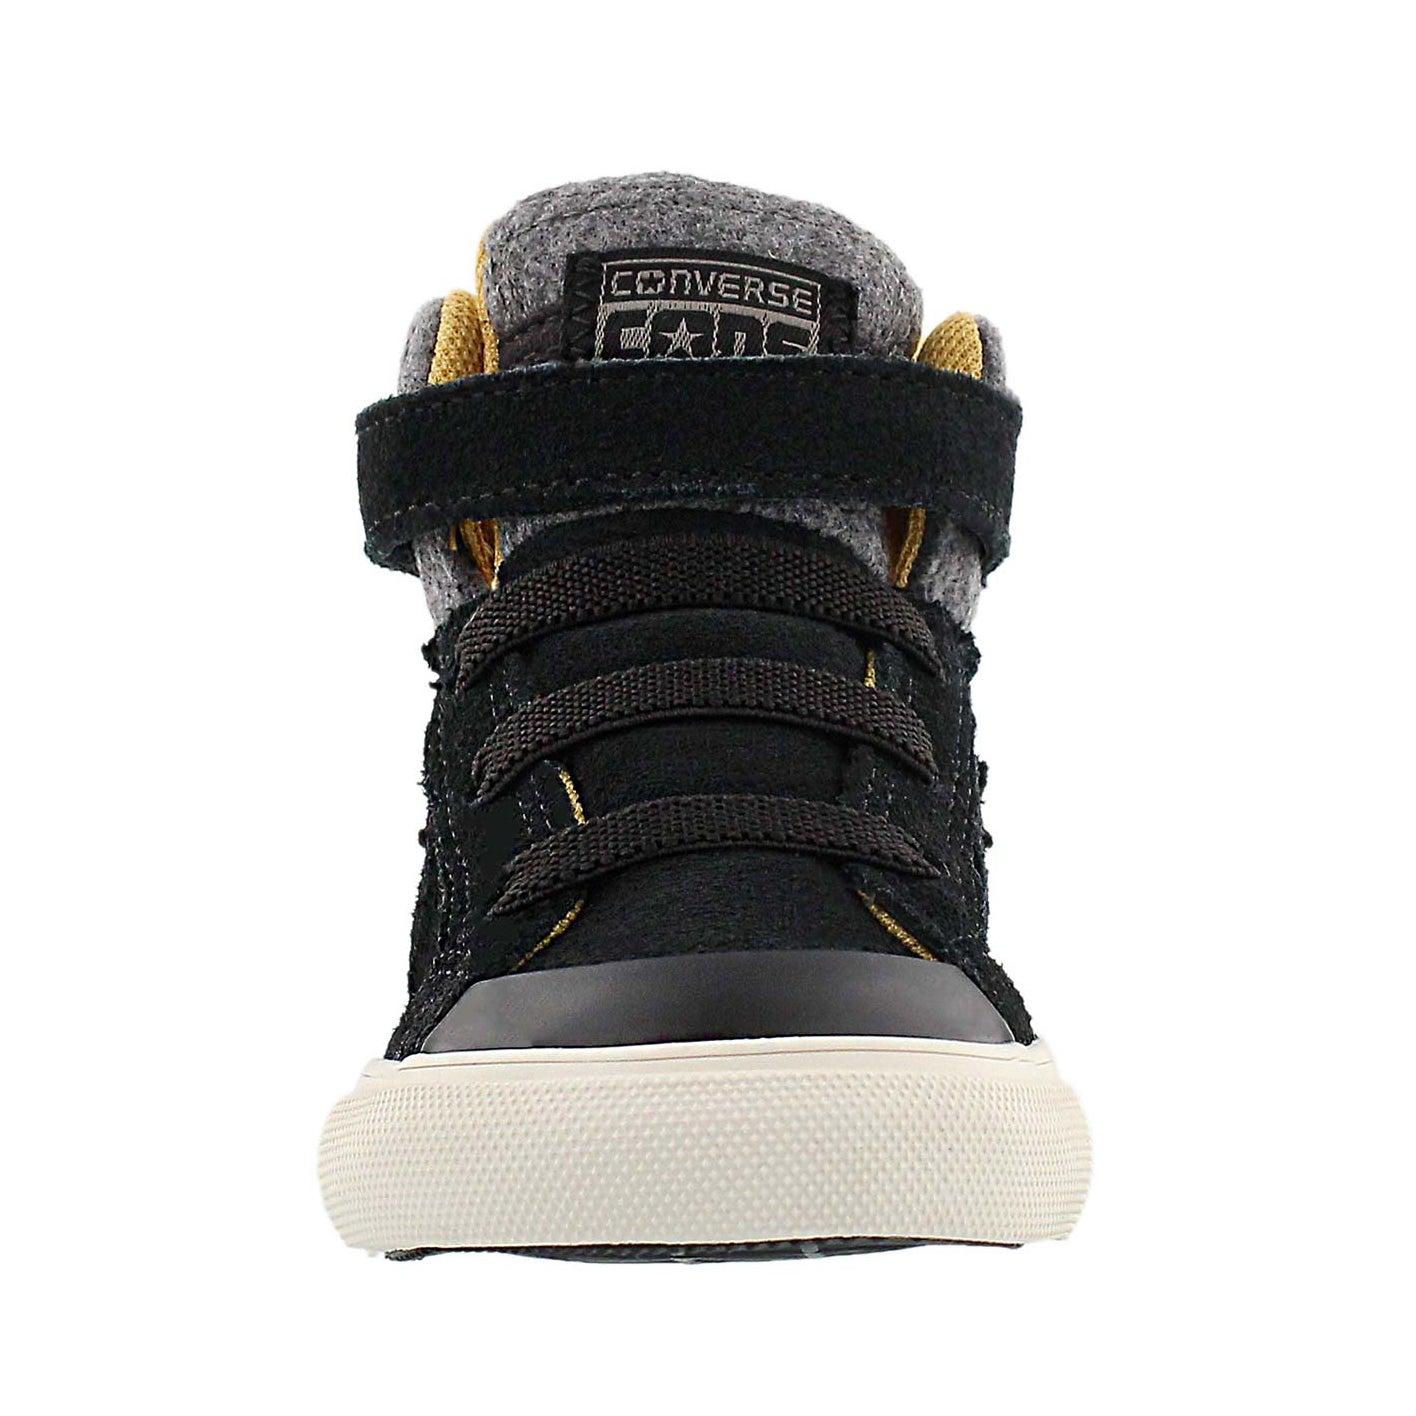 Infs Pro Blaze Strap blk hi top sneaker